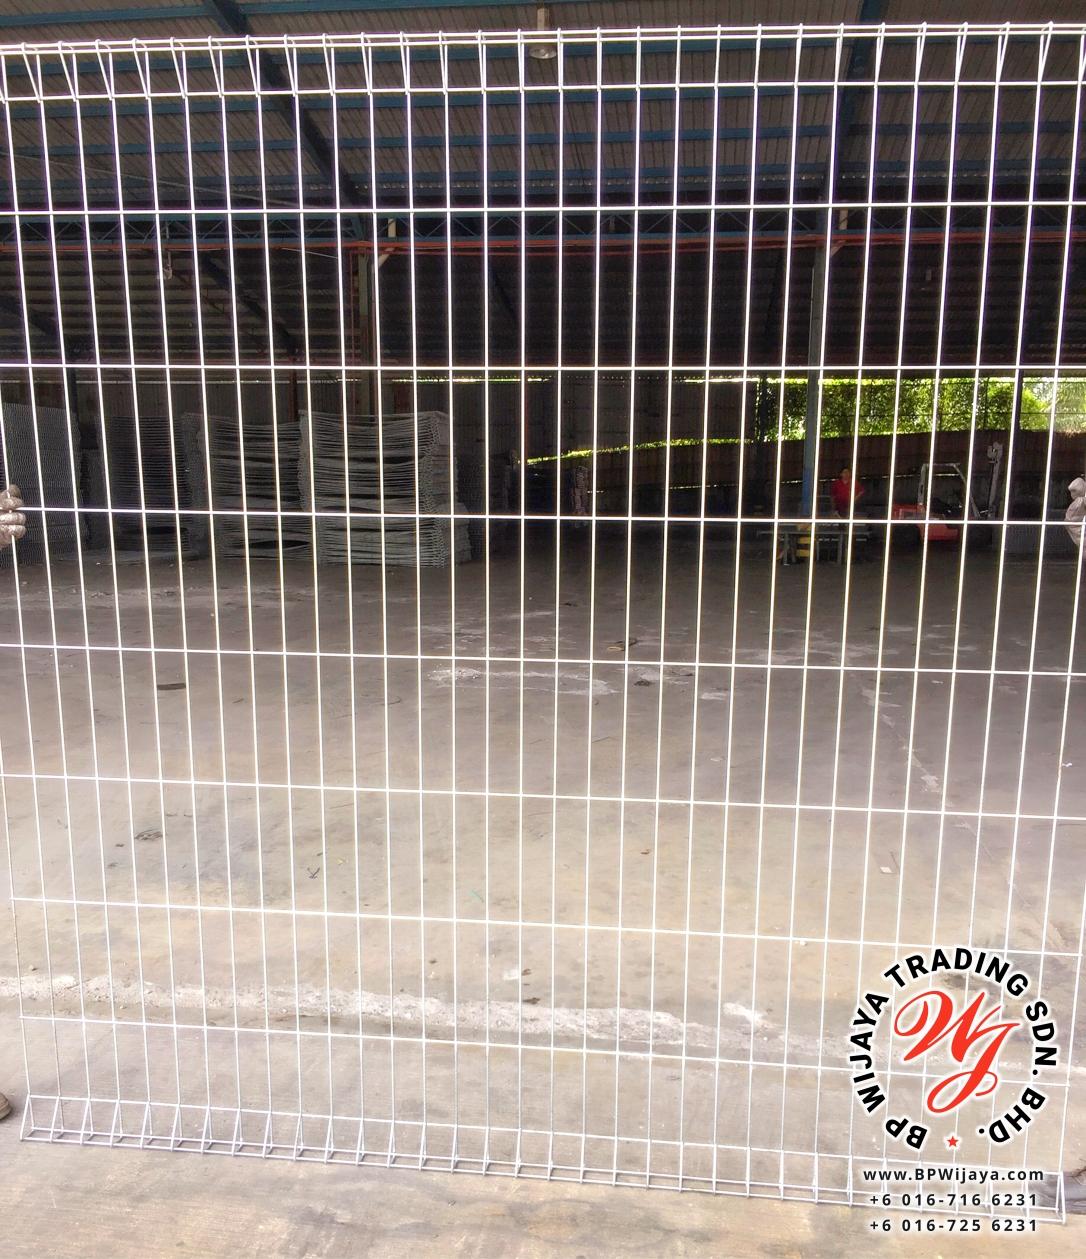 BP Wijaya Trading Sdn Bhd Malaysia Johor Batu Pahat manufacturer of safety fences building materials Hotdip Galvanized Fence Mesh Wire Fence FA BRC B09